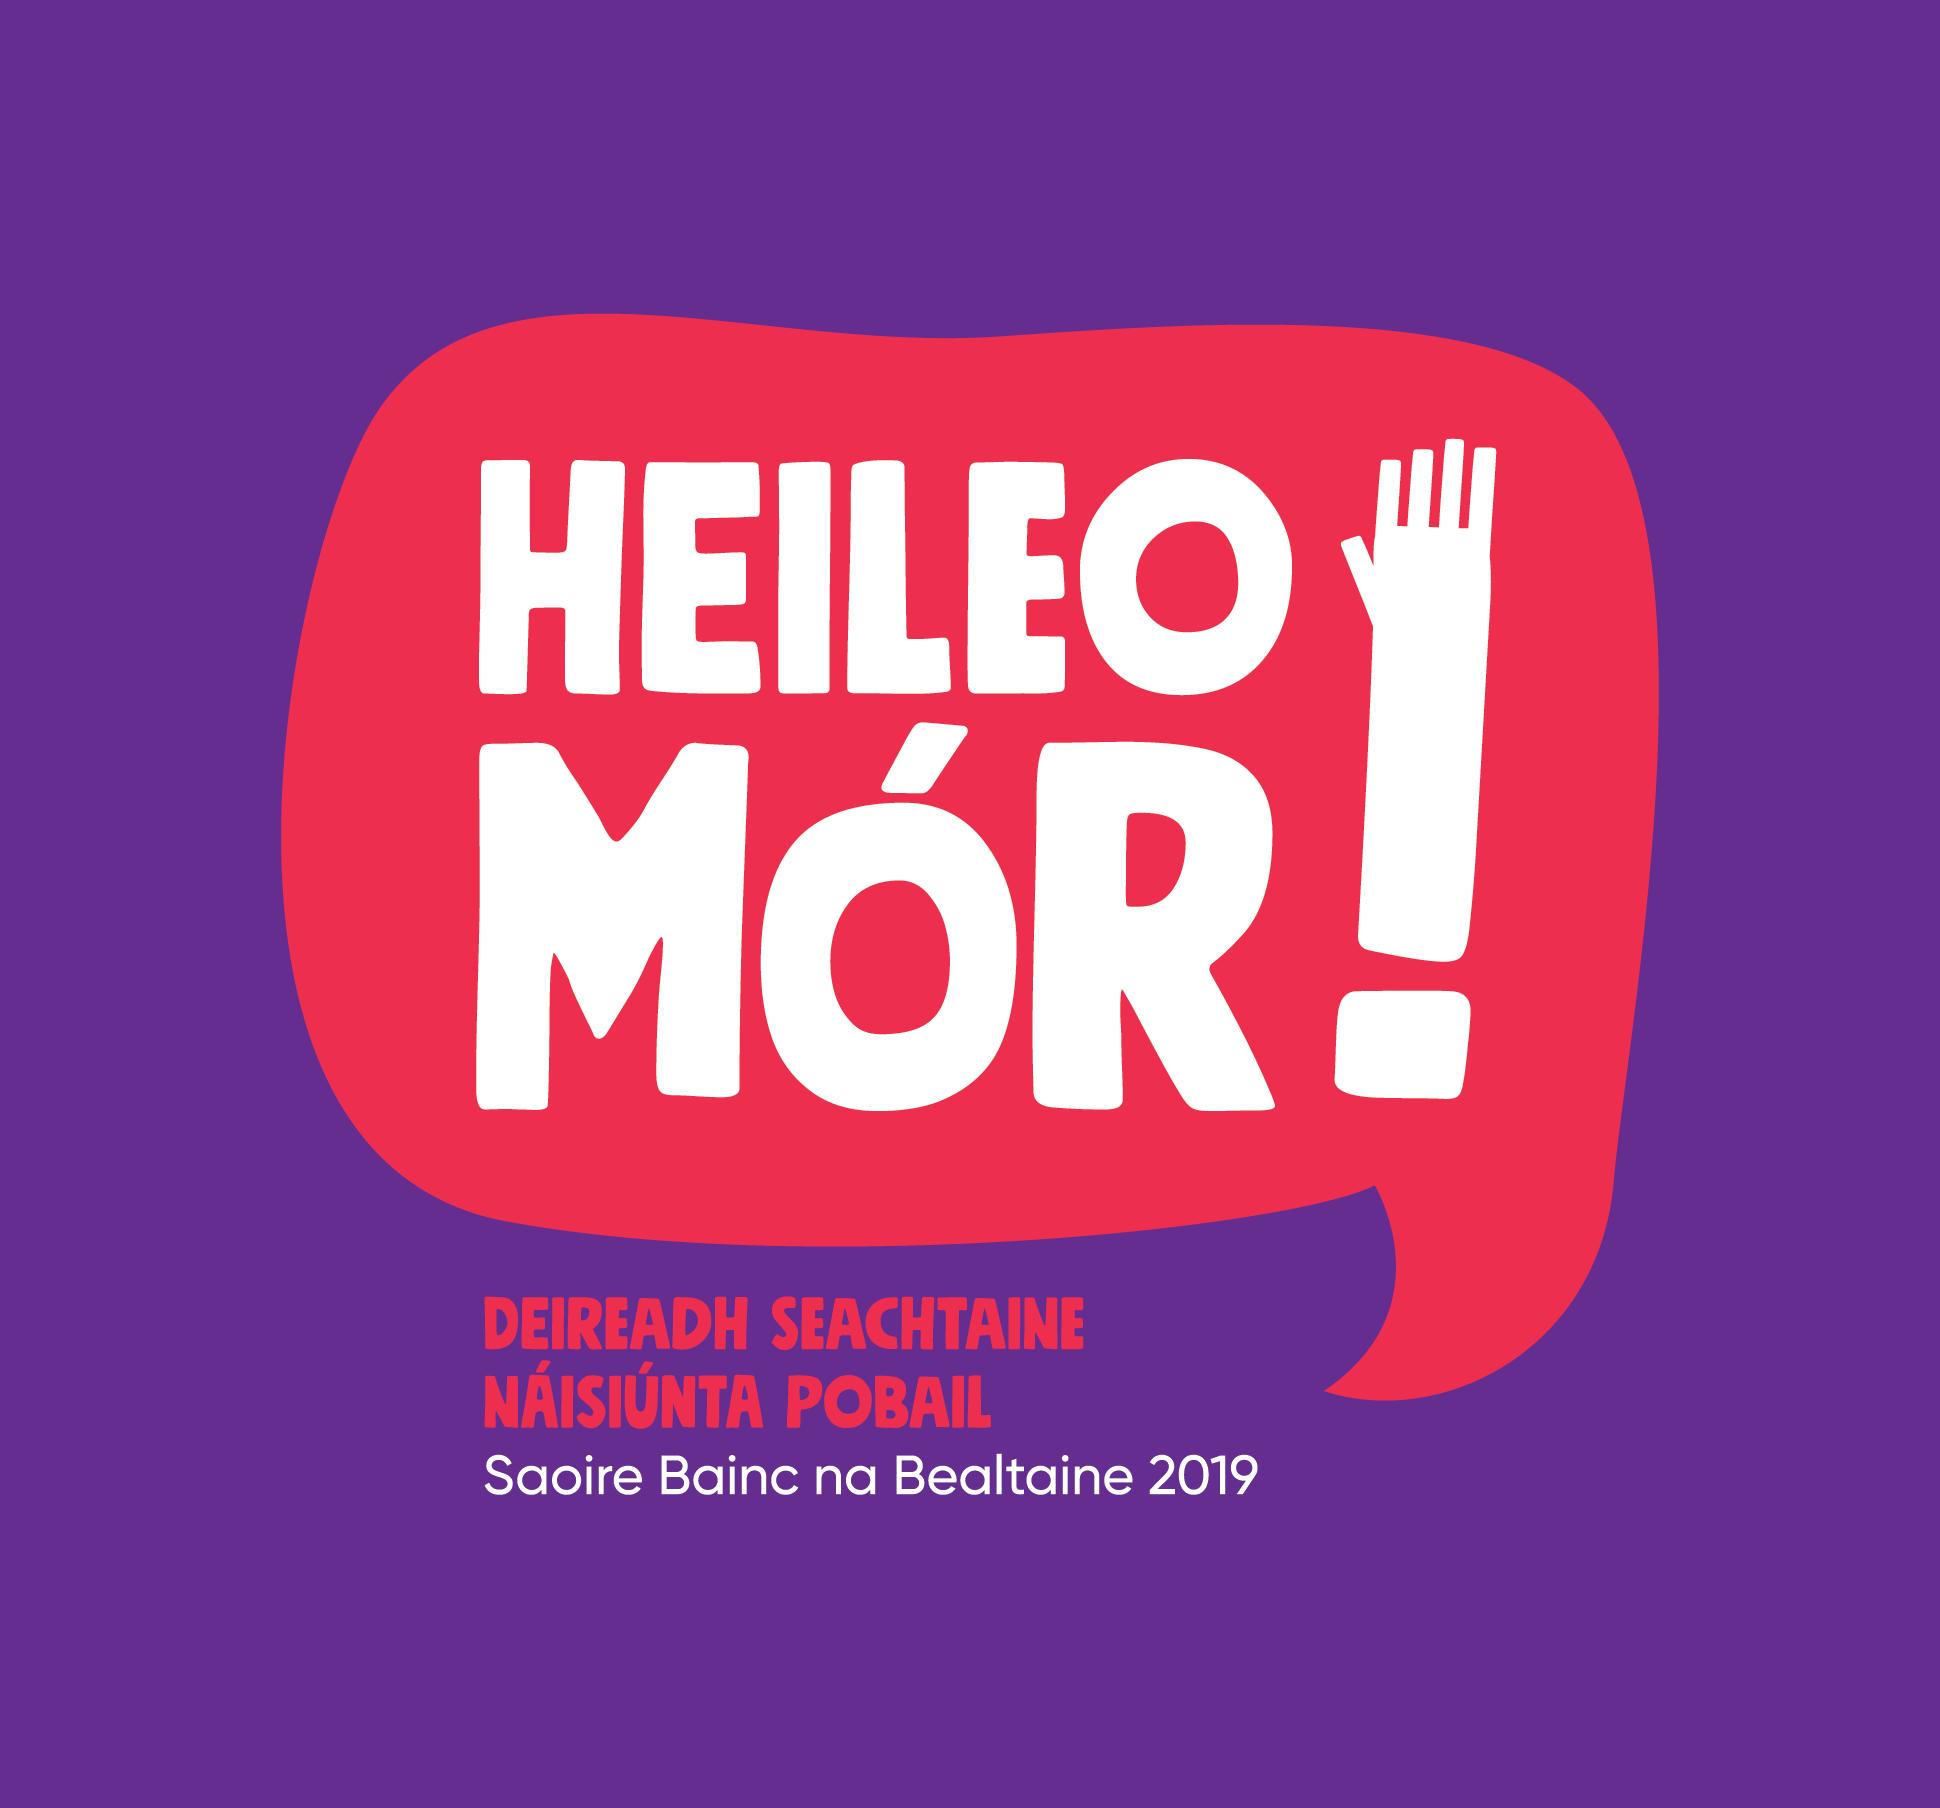 Heileo Mór Poster